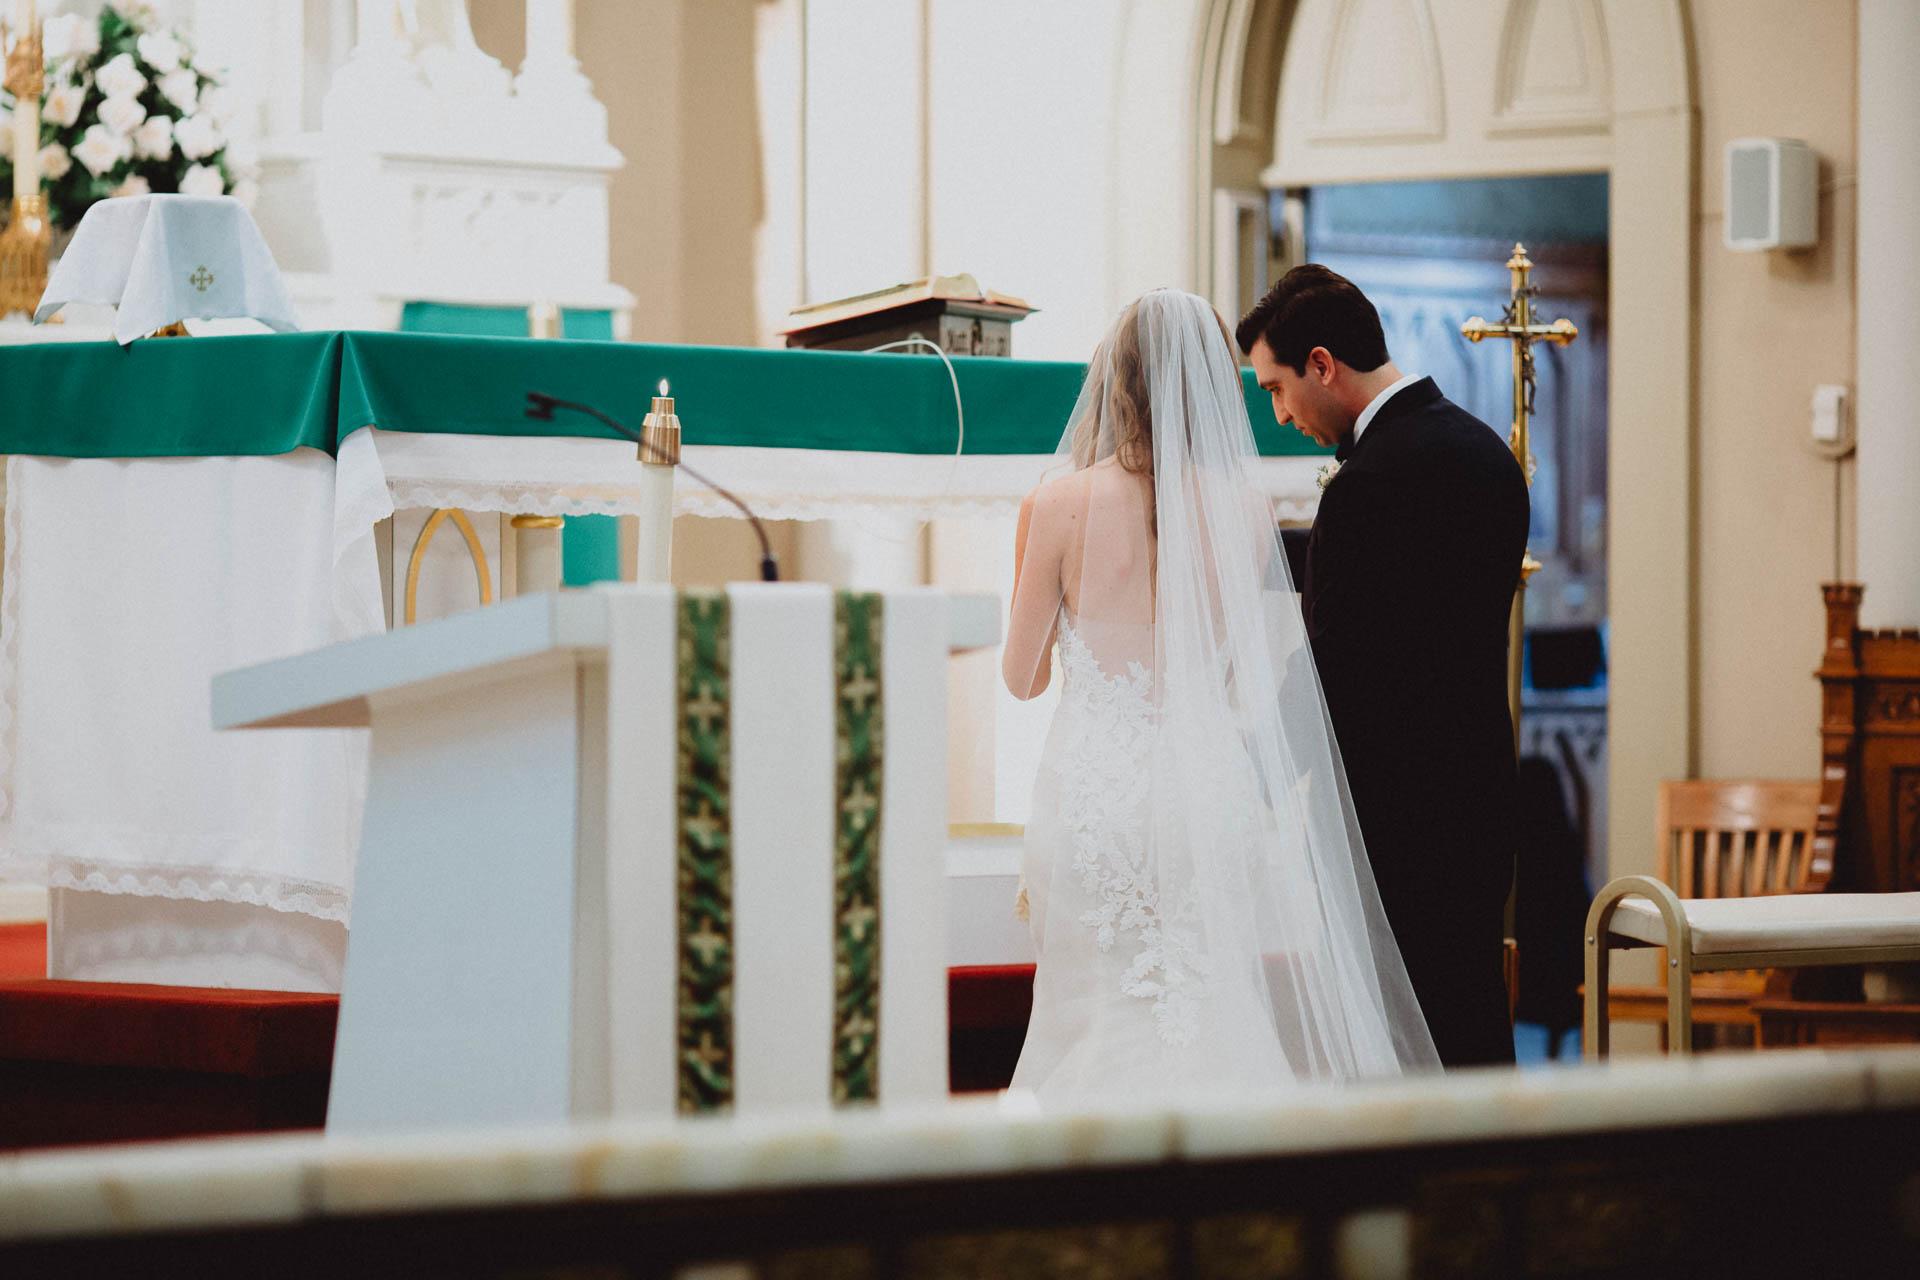 Keri-Joseph-Top-of-the-Market-Wedding-077@2x.jpg